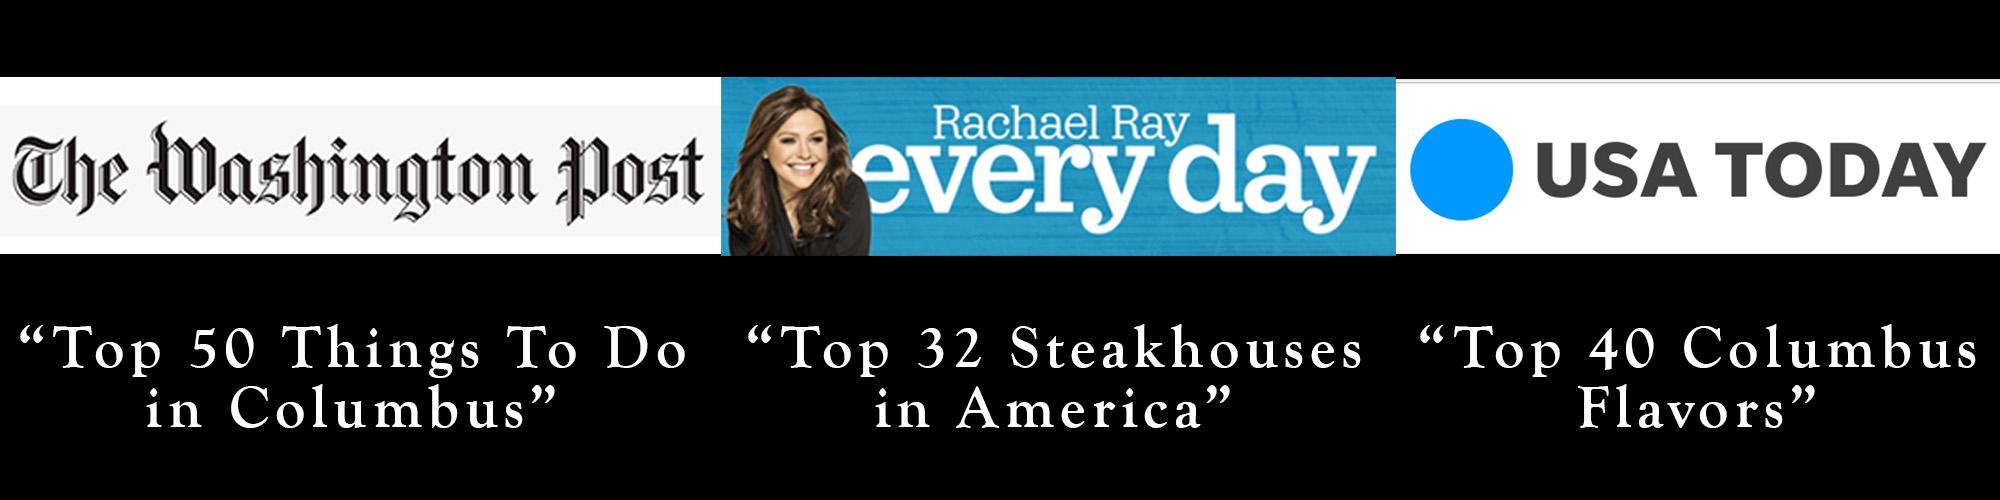 top-steakhouse-website-press